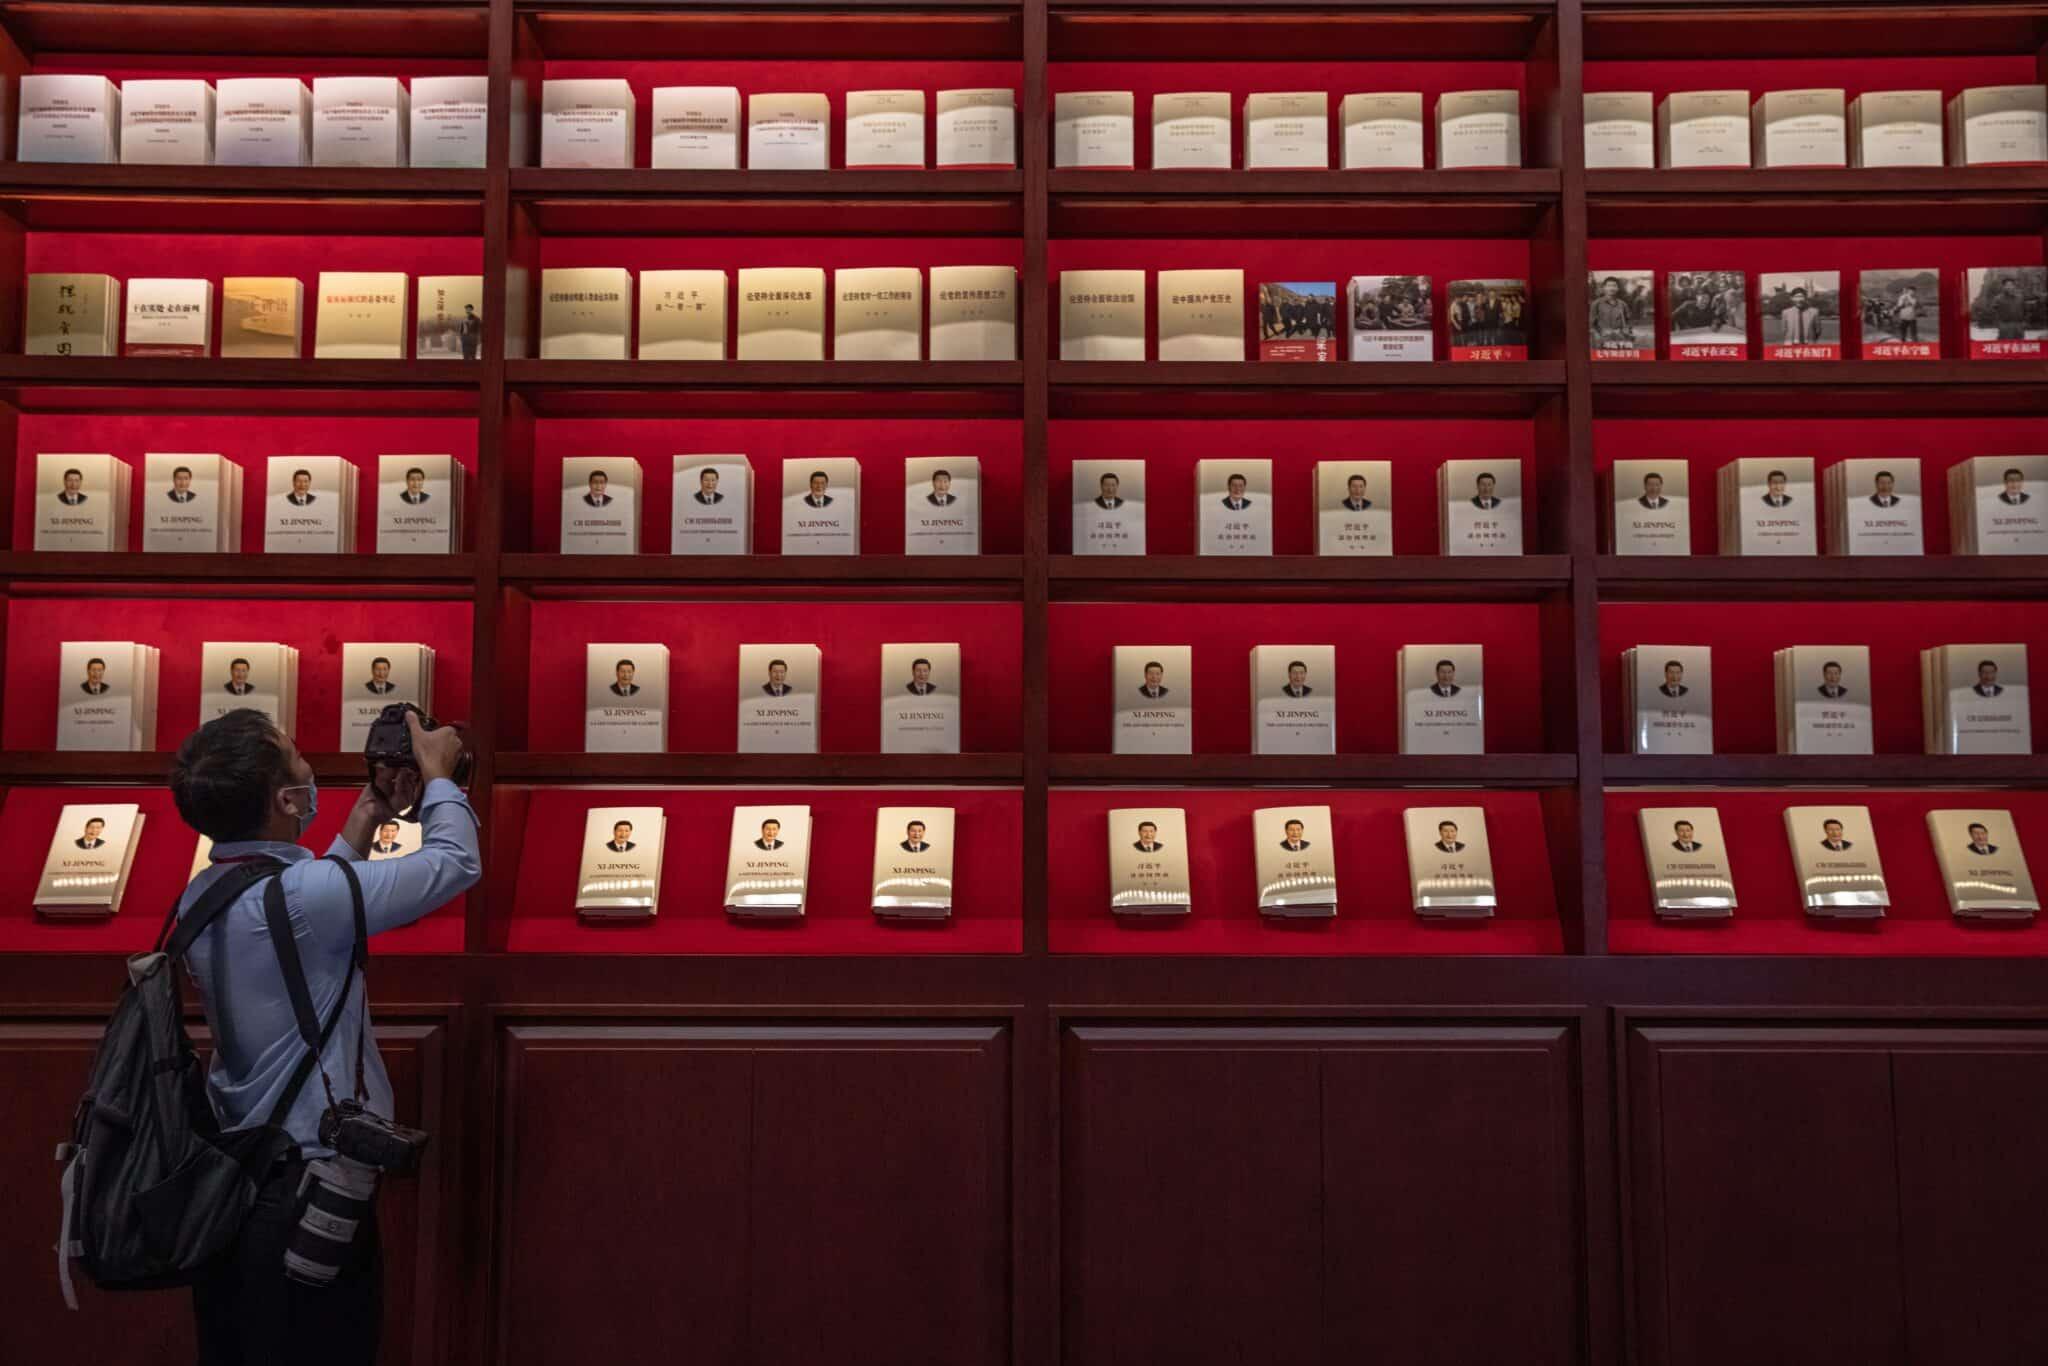 Fotógrafo capta instantáneas del libro 'La gobernancia de China' del actual líder chino Xi Jinping